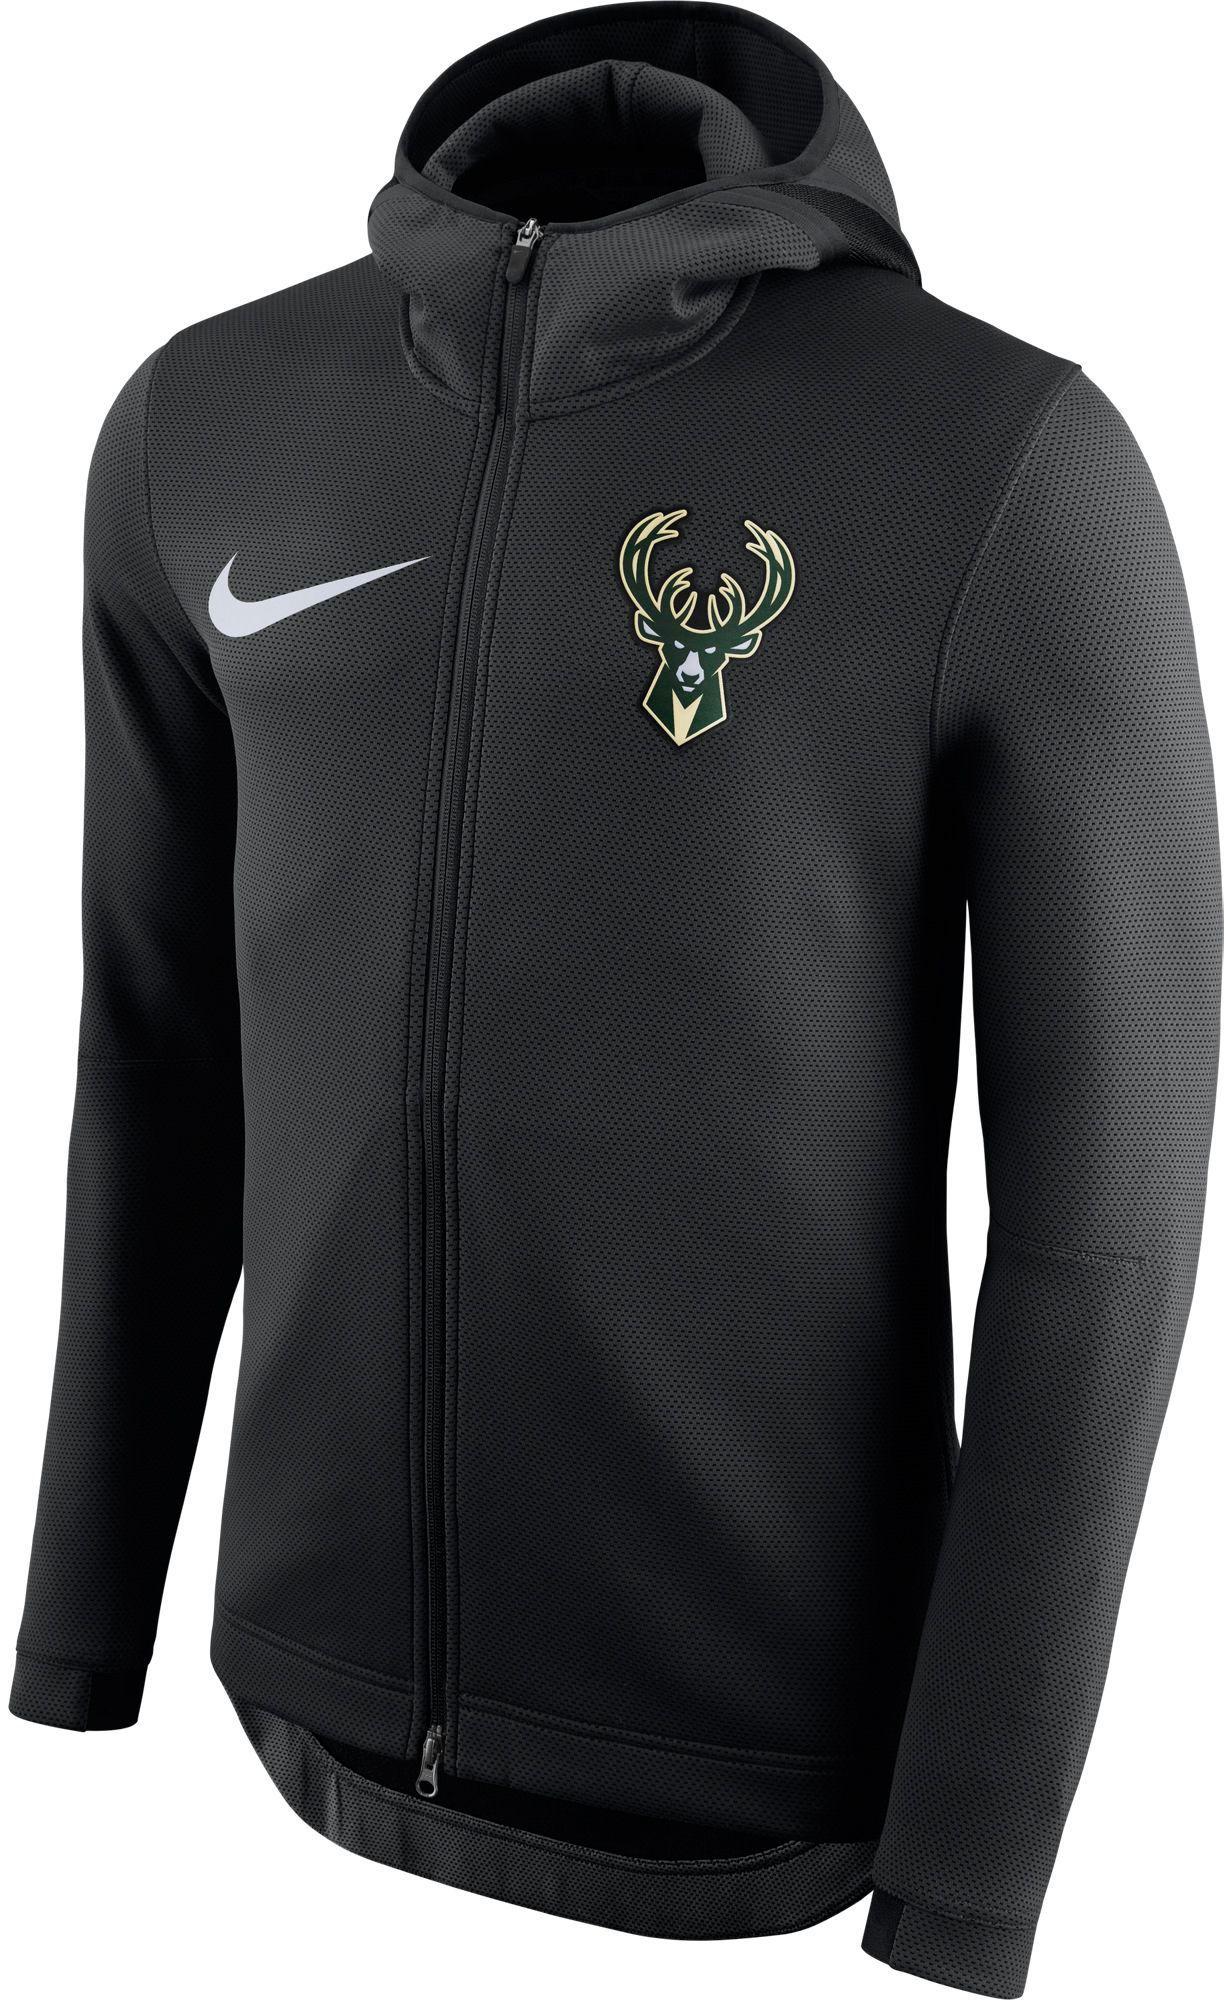 7ab54de2b2 Nike Men's Milwaukee Bucks On-Court Therma Flex Showtime Full-Zip ...